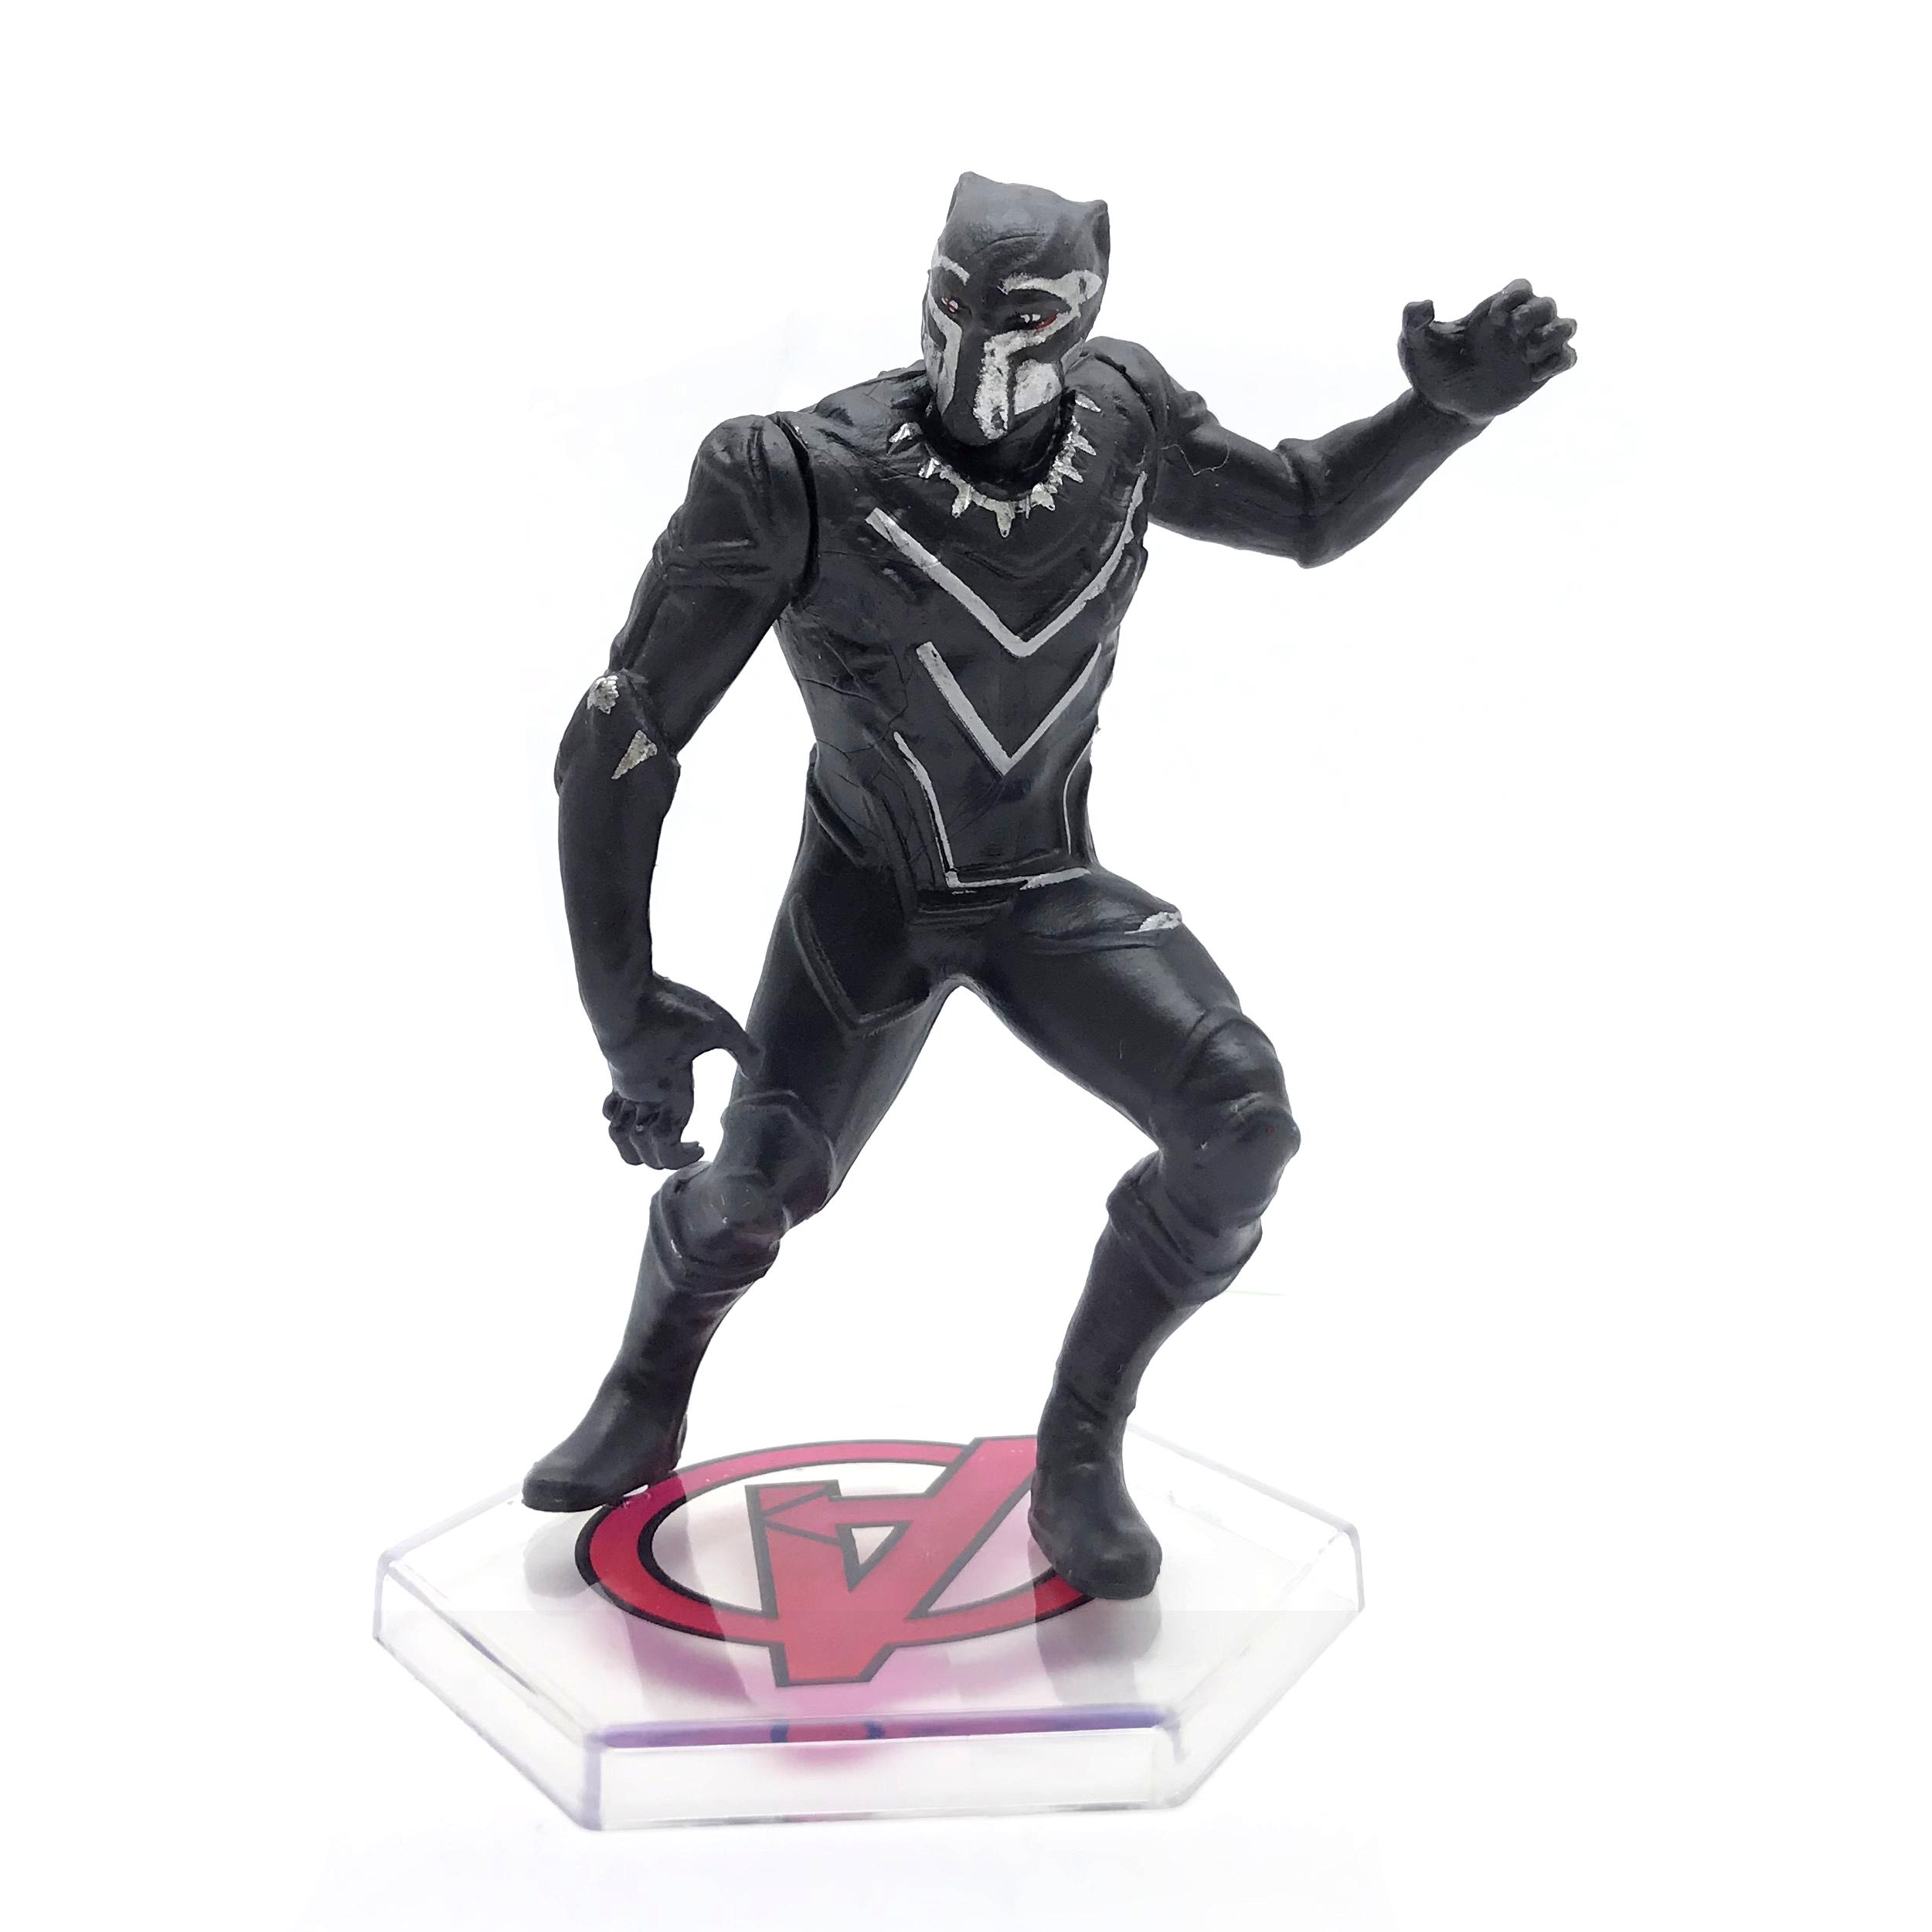 فیگور طرح Black Panther کد 01